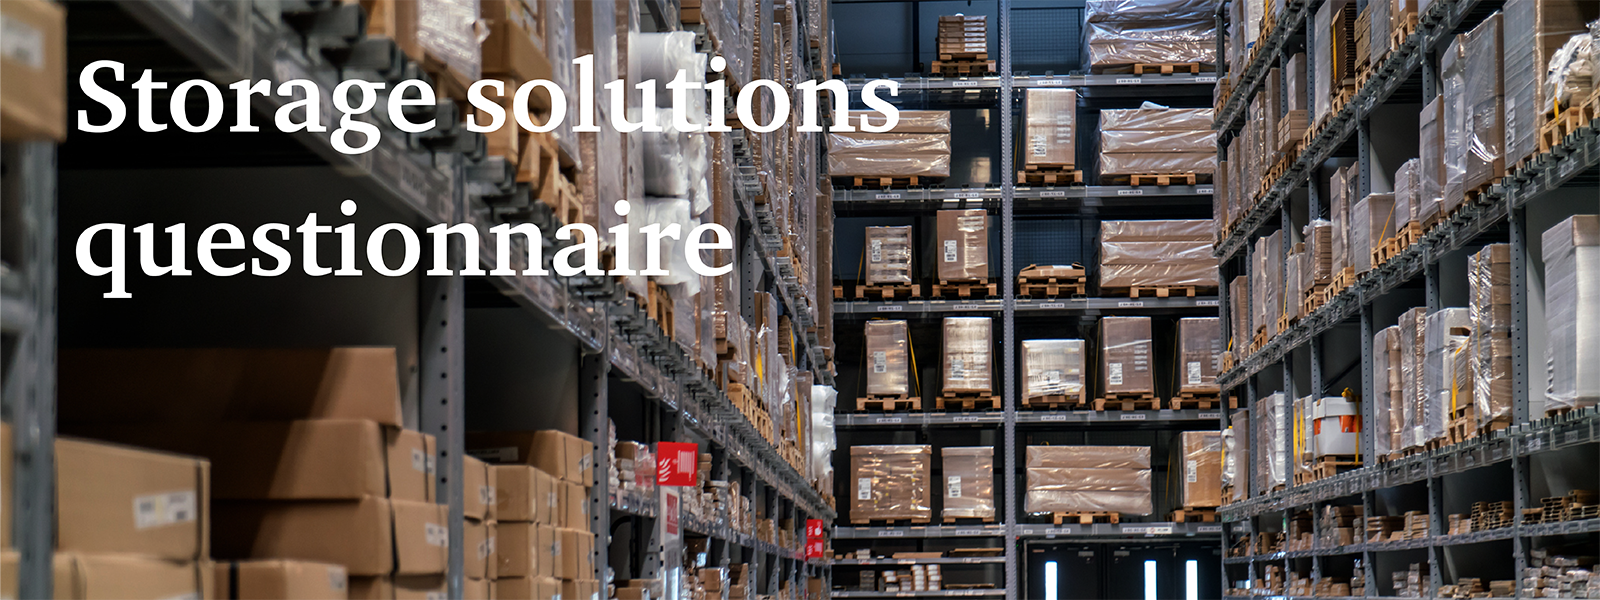 Storage solutions questionnaire